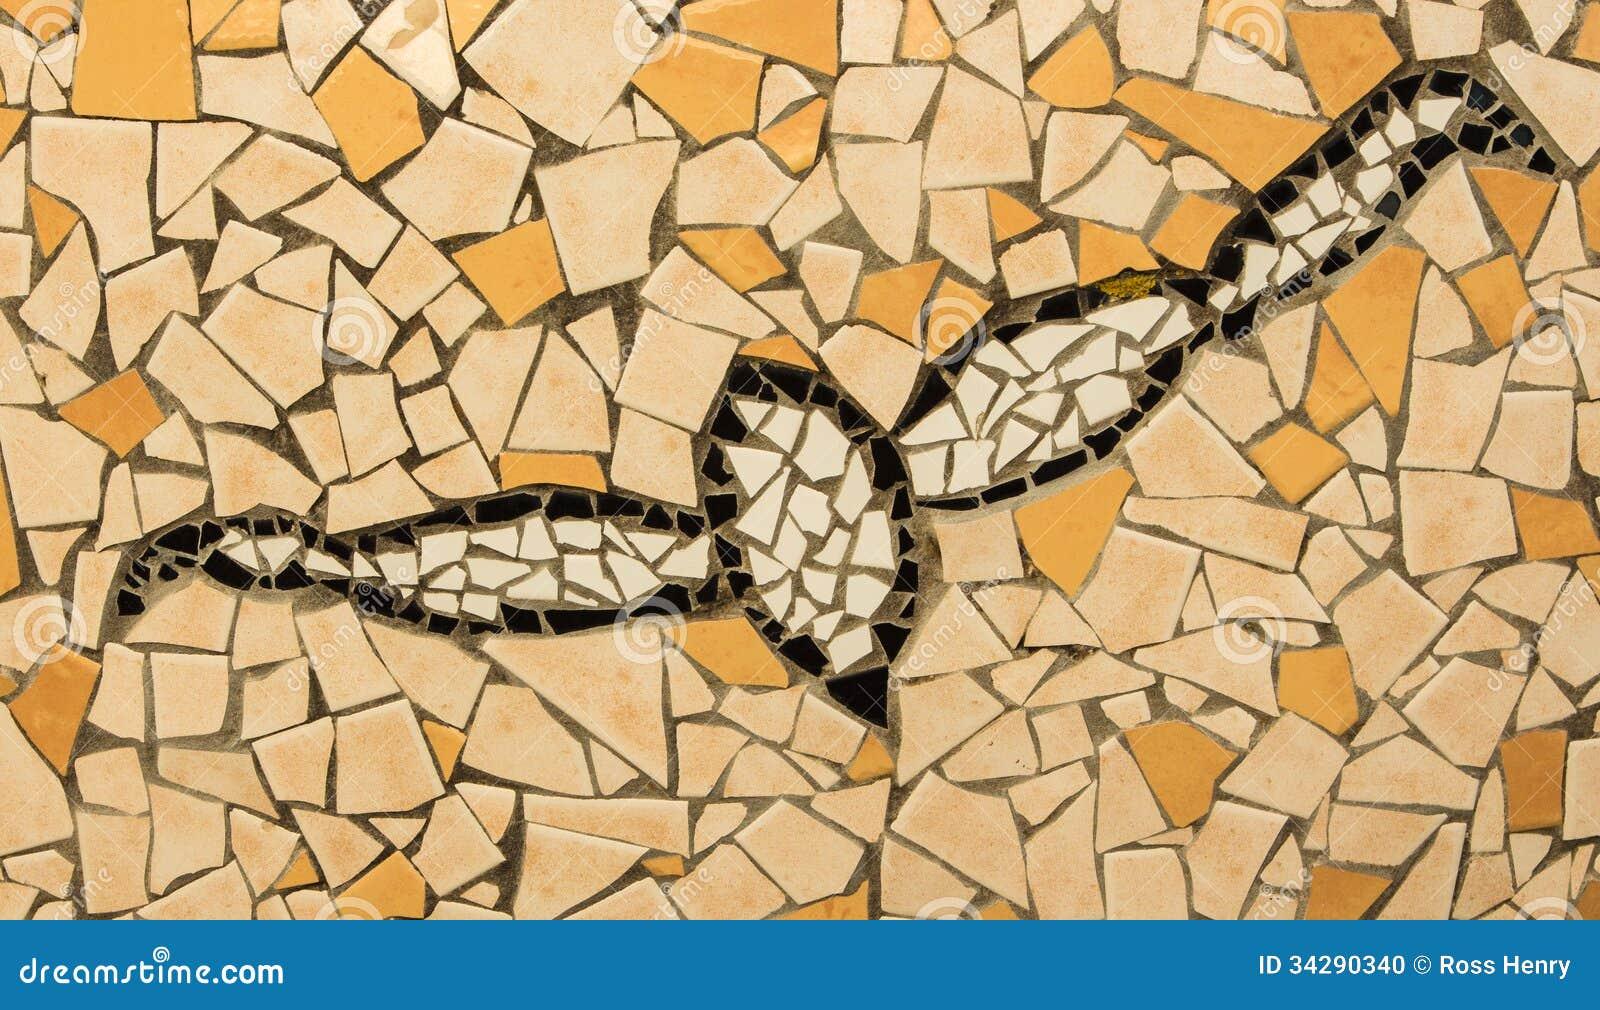 Ceramic Bird Texture stock photo. Image of pattern, texture - 34290340